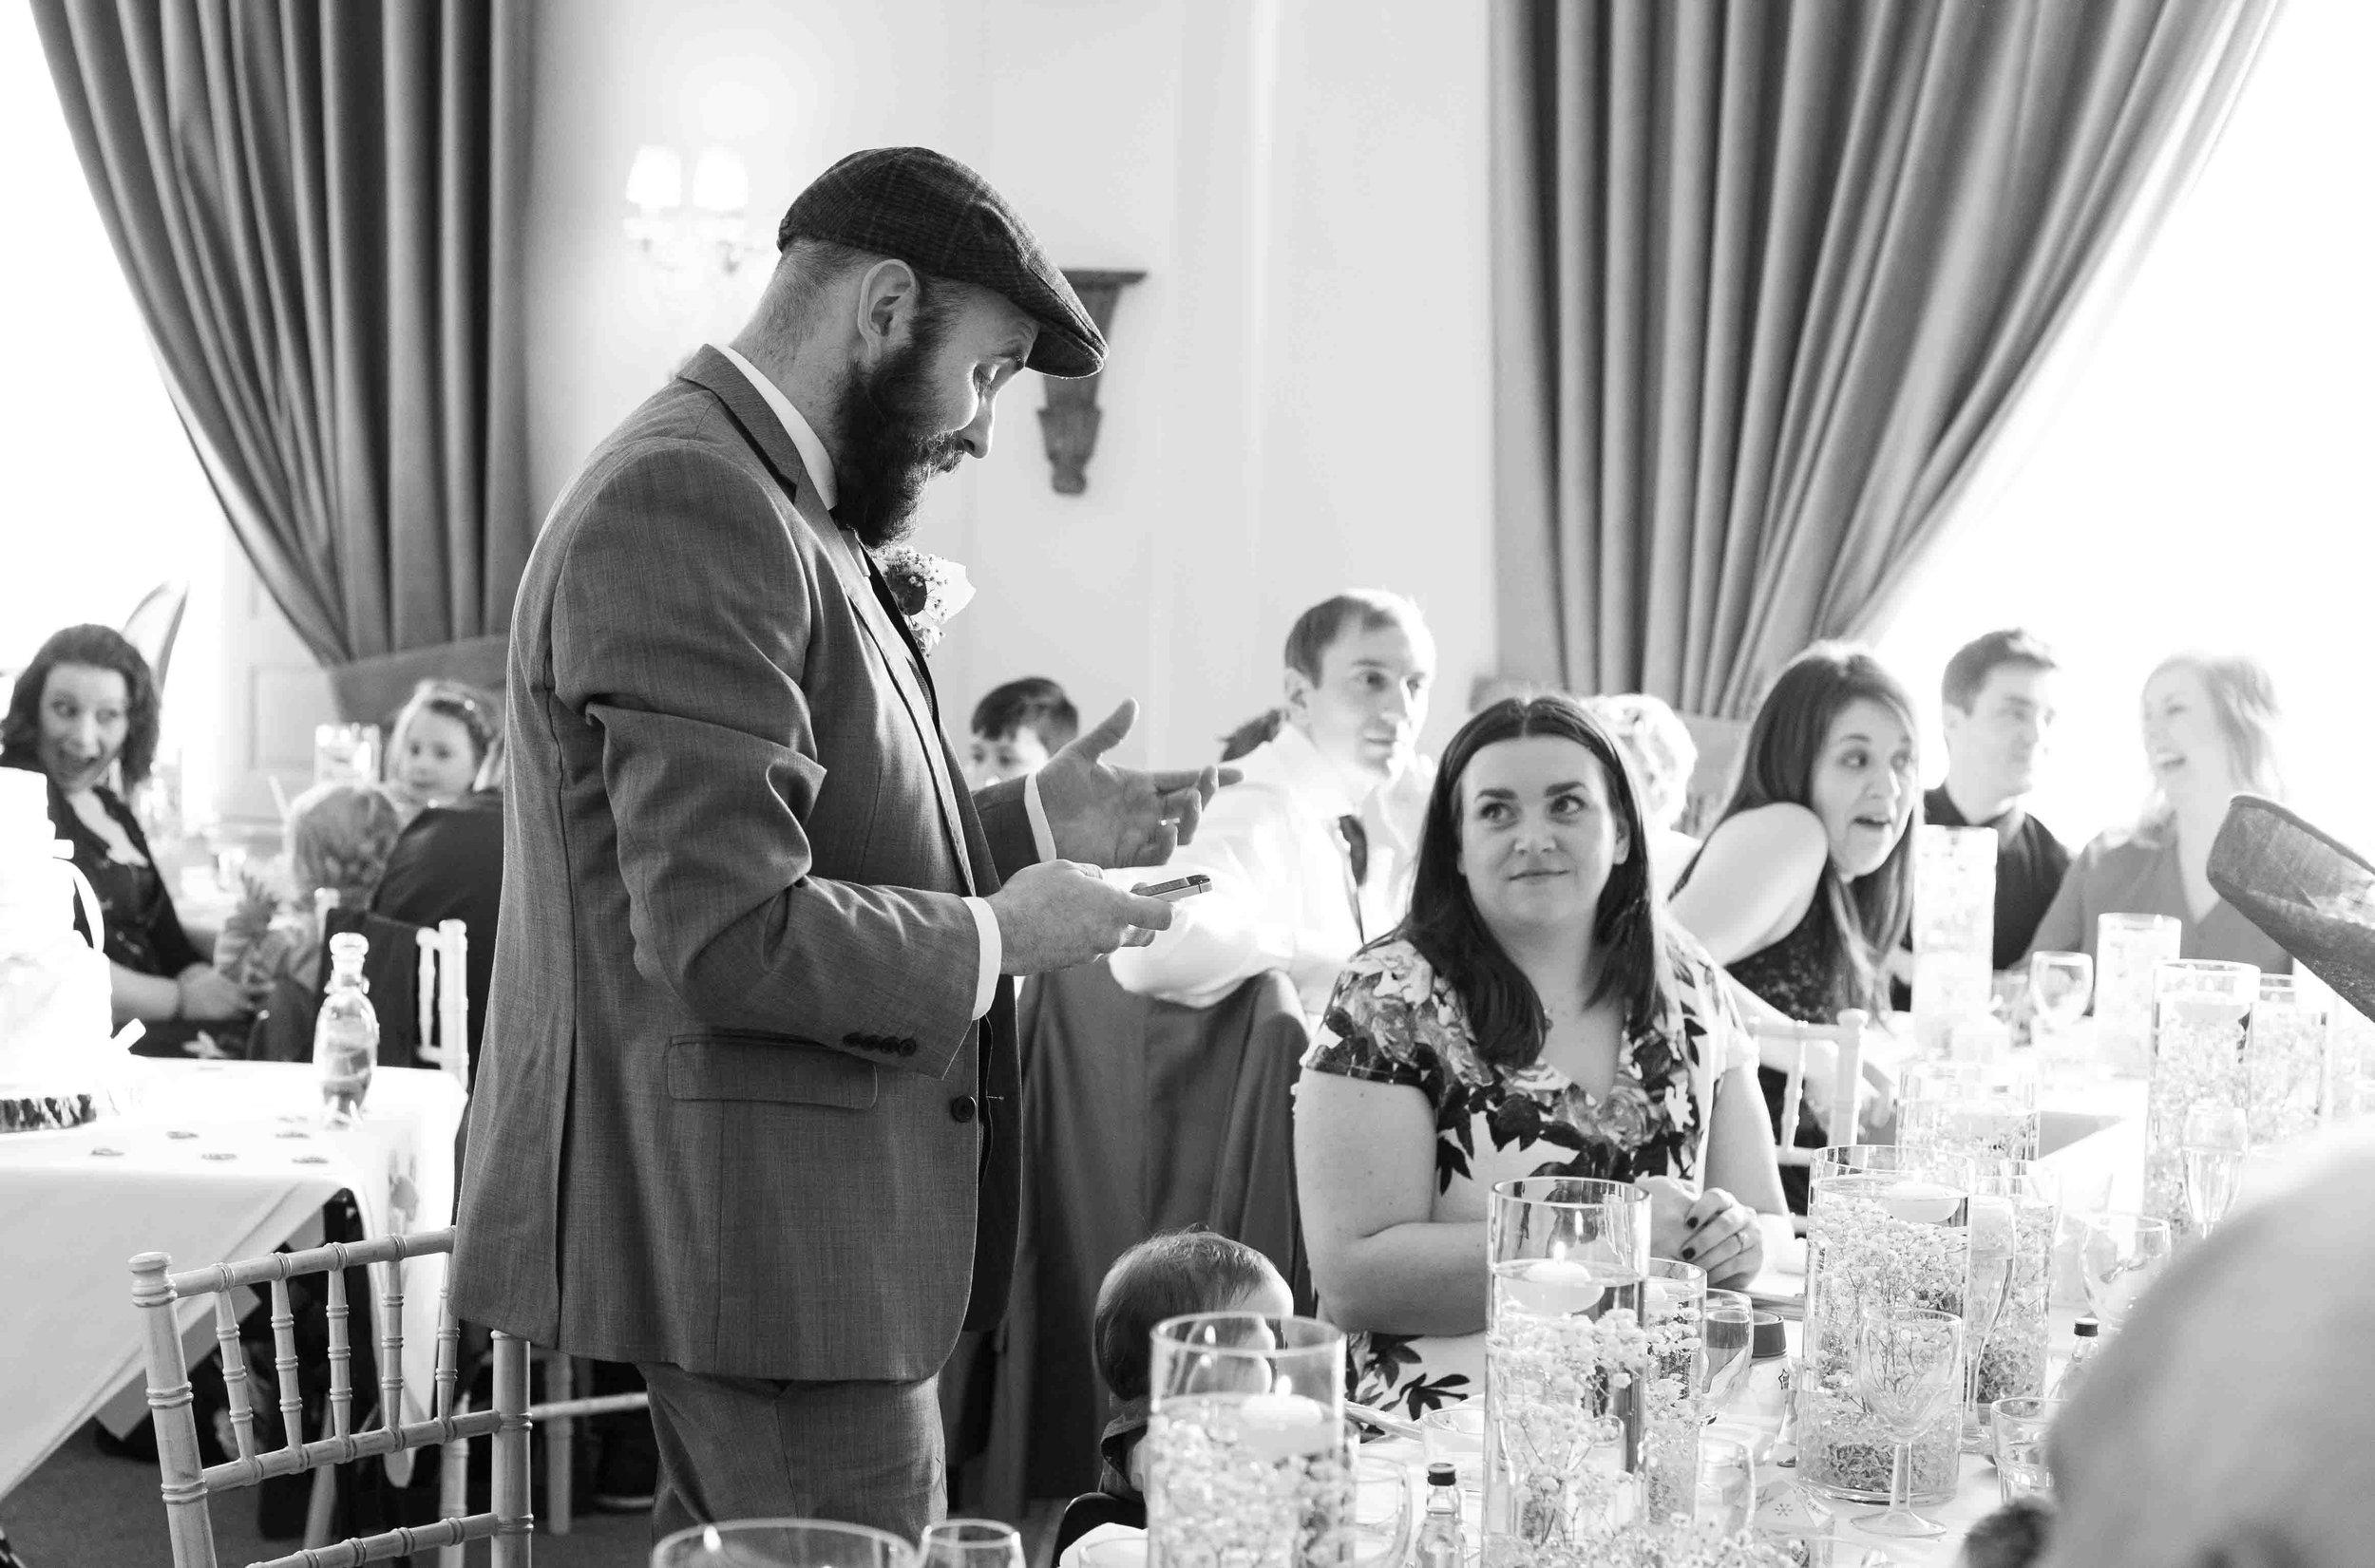 wedding-photos-willenhall-wedding-photographer-wolverhampton-wedding-photographer-west-midlands-wedding-photographer-birmingham-best-mans-speech.jpg